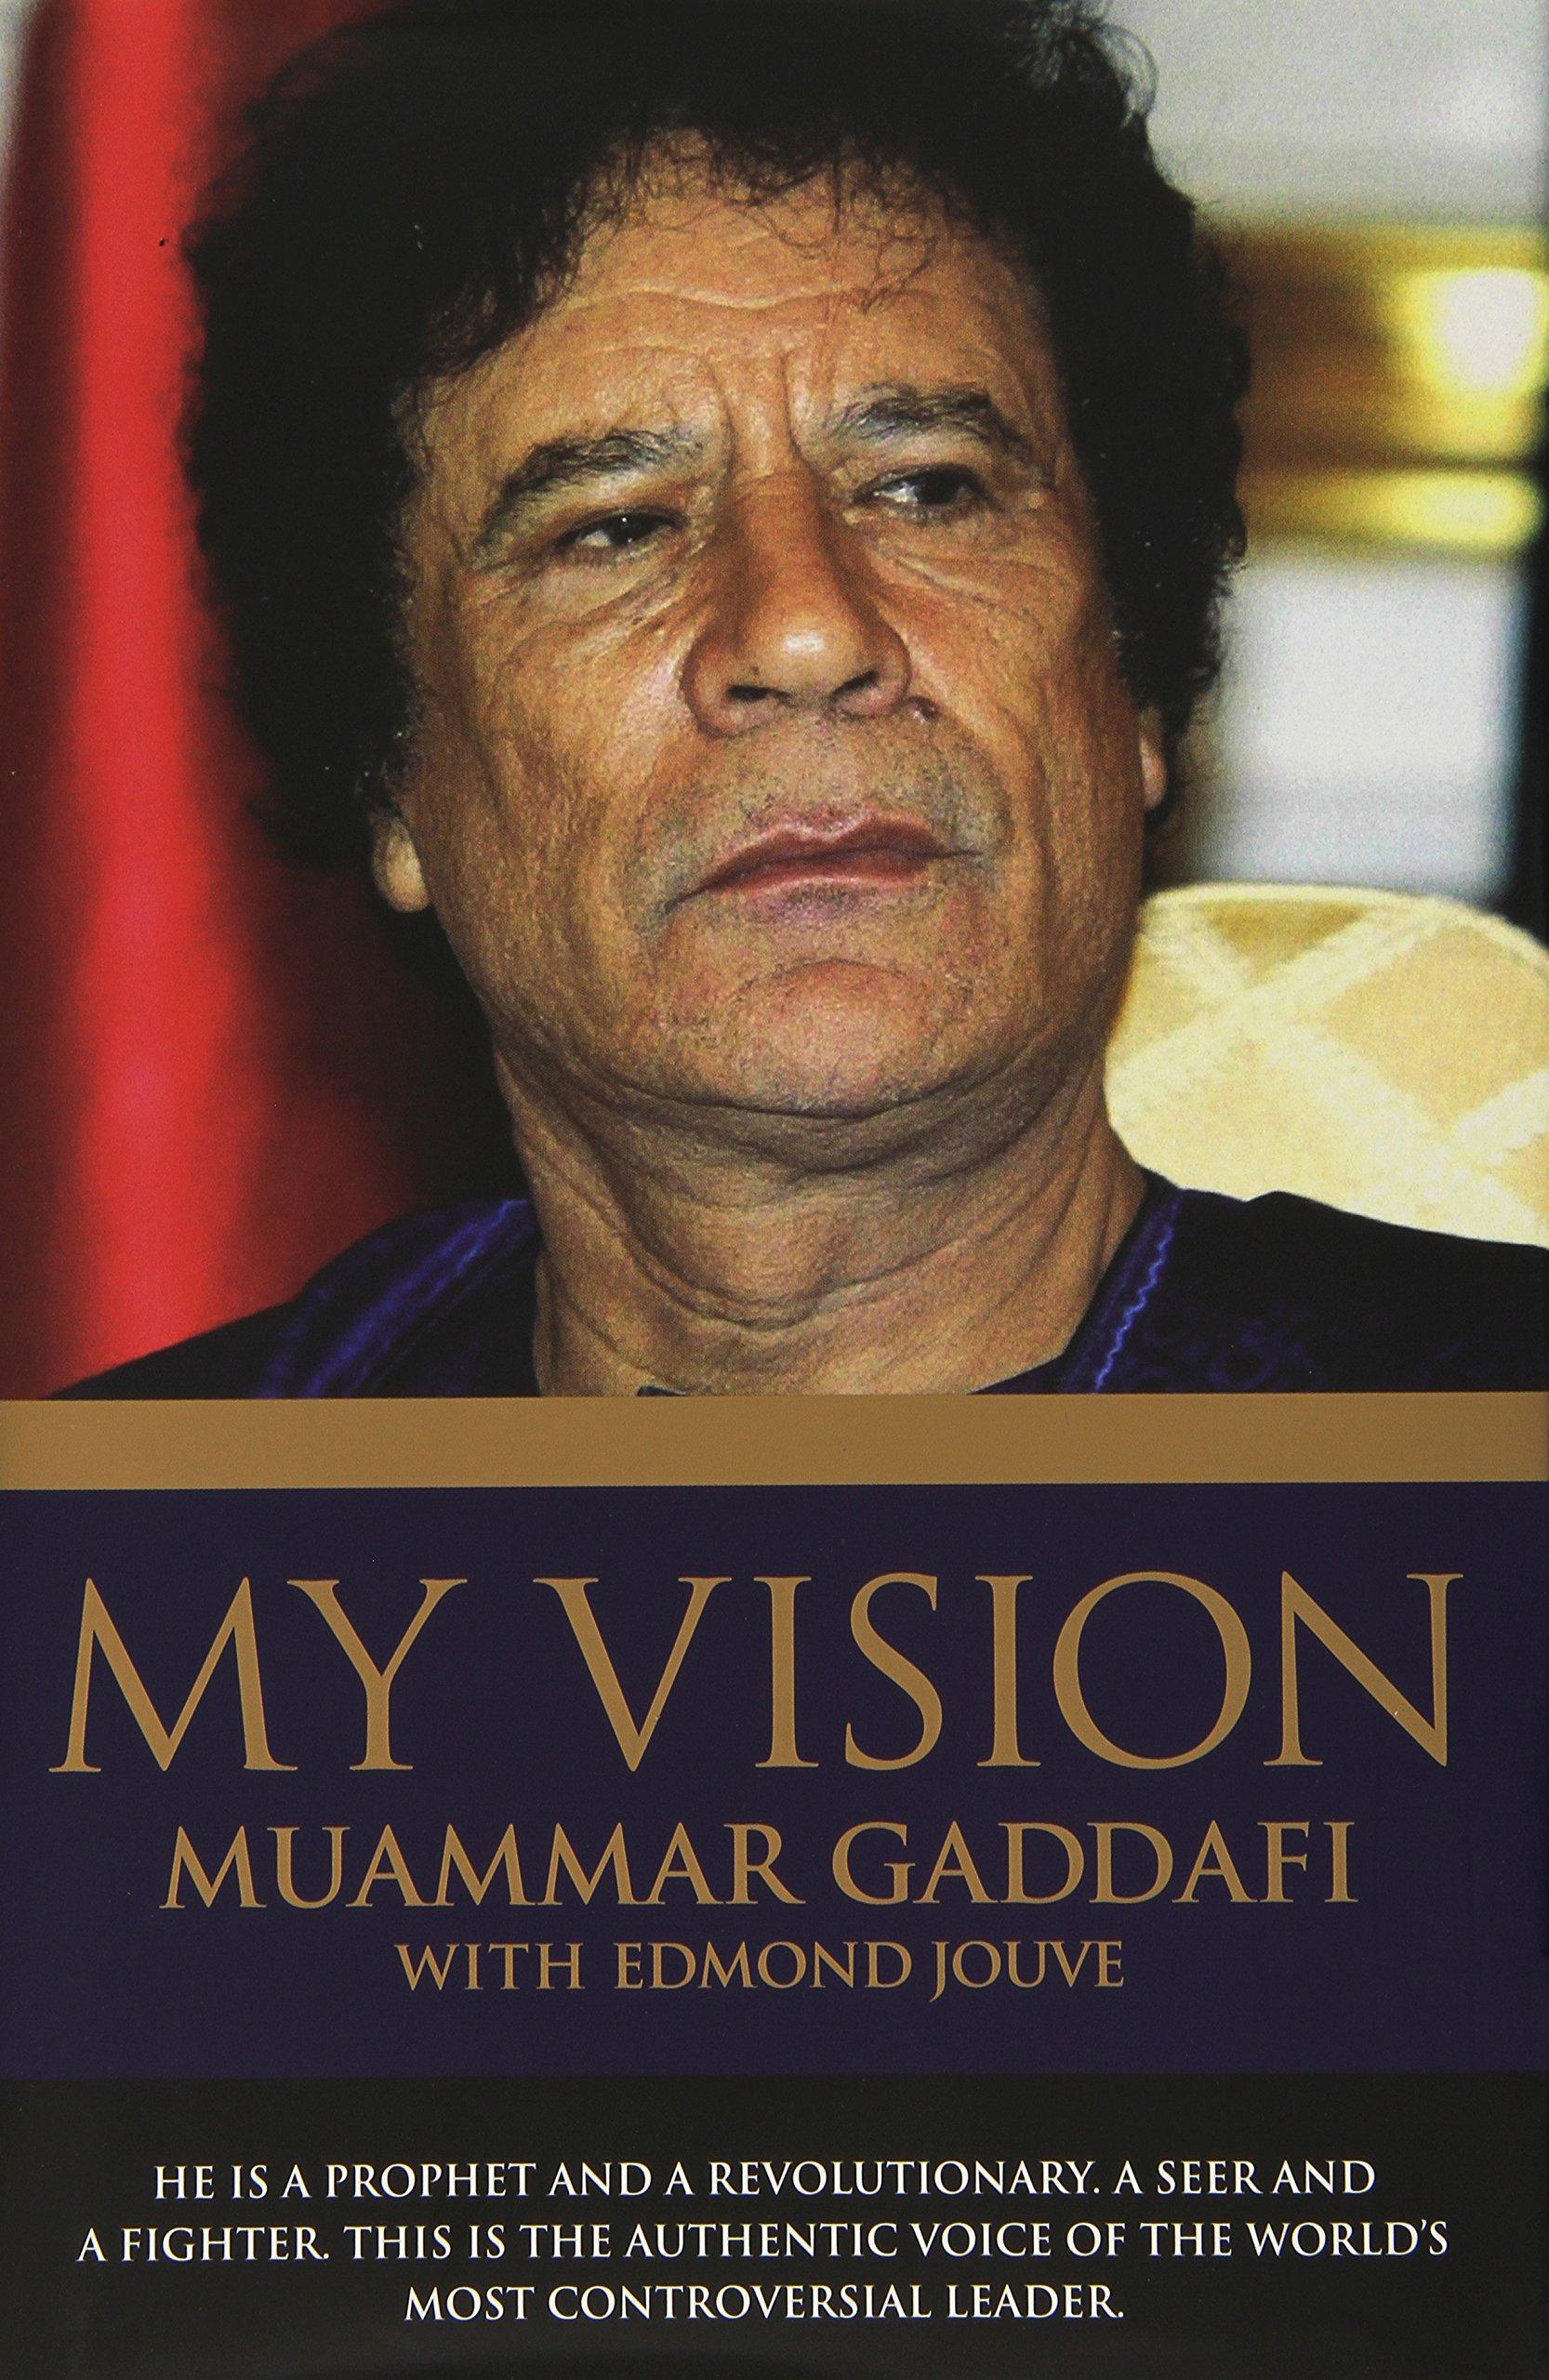 download muhamir gaddafi books